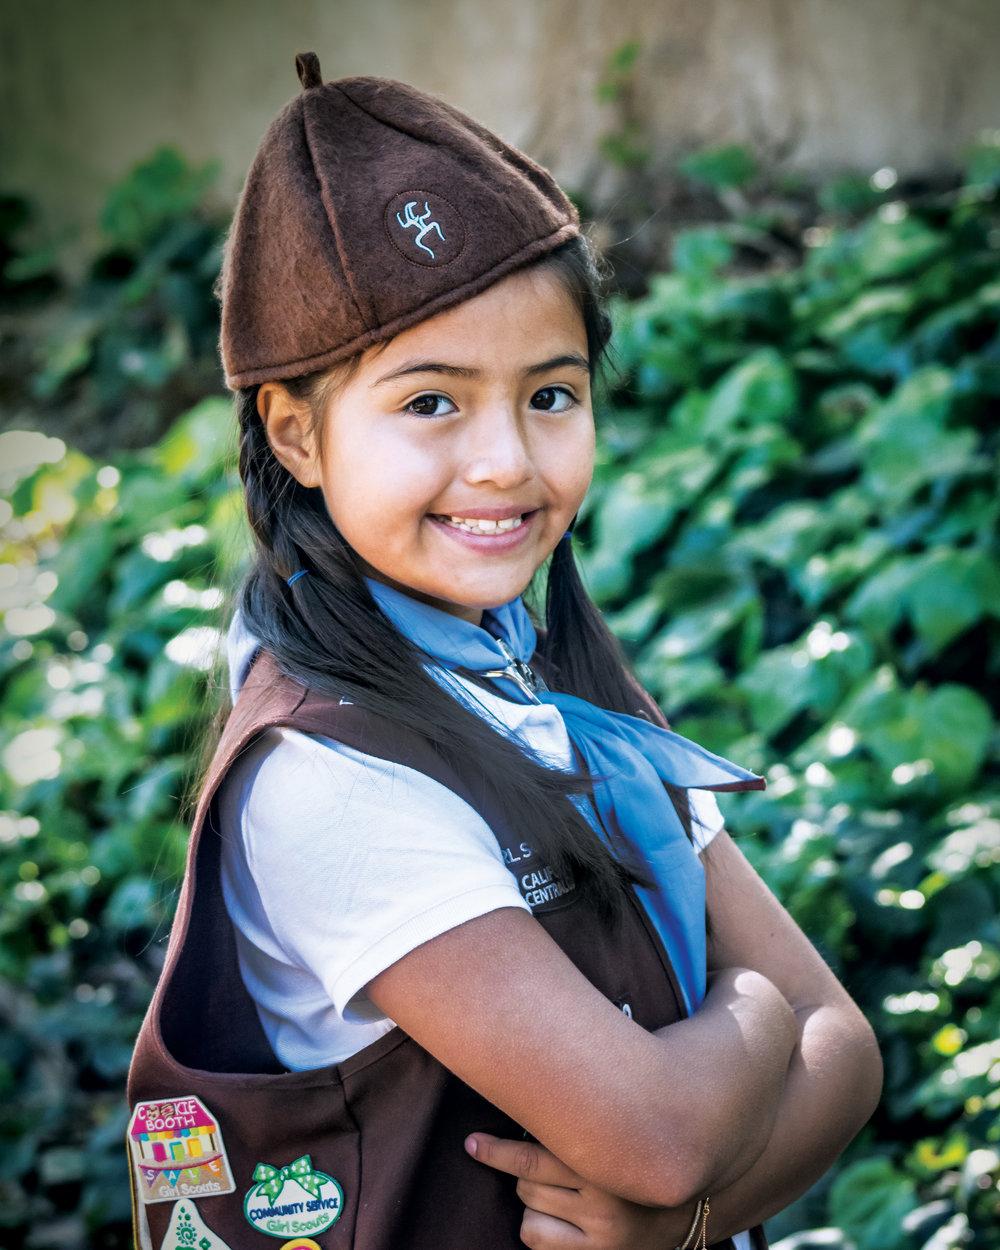 GirlScout-4.jpg